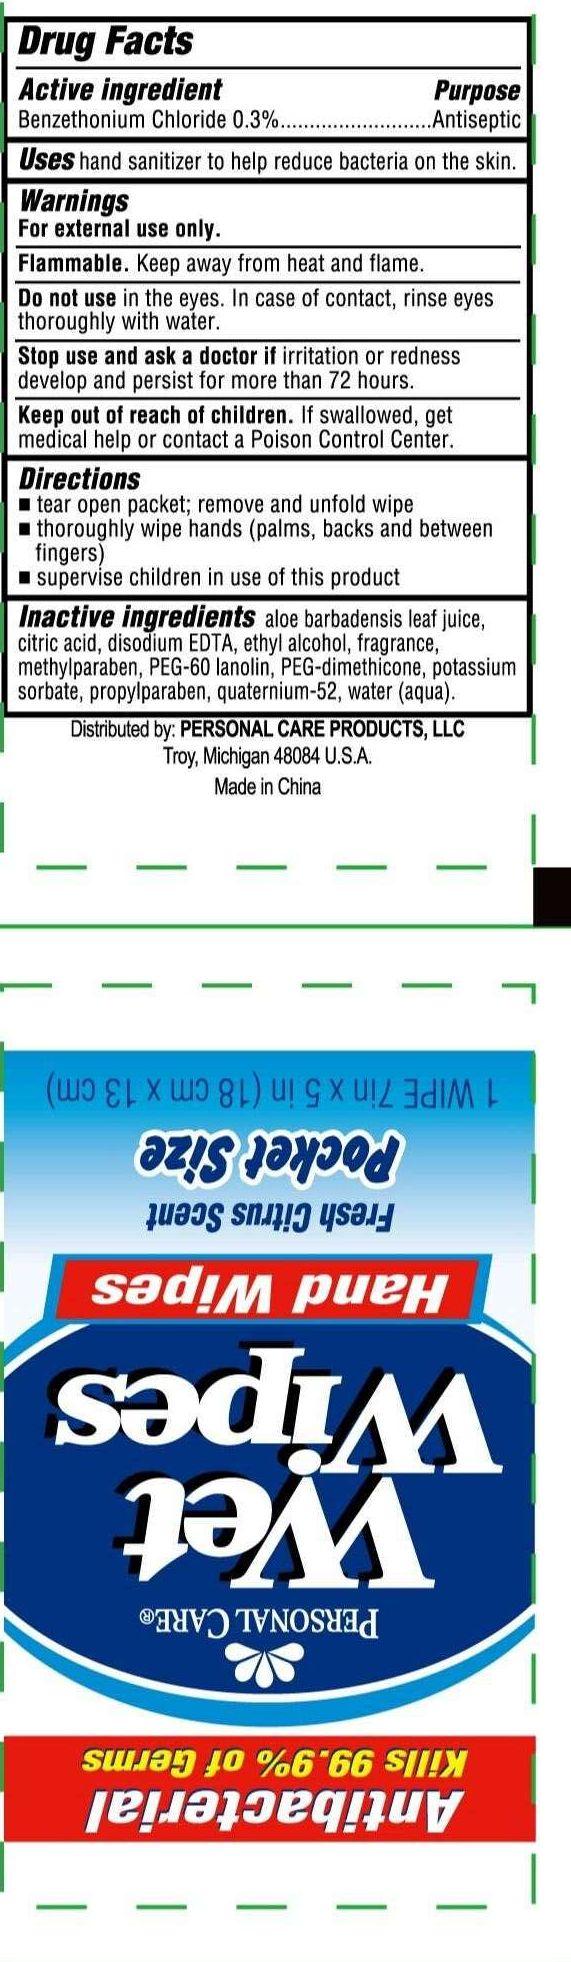 benzethonium chloride (Antibacterial Wipes)